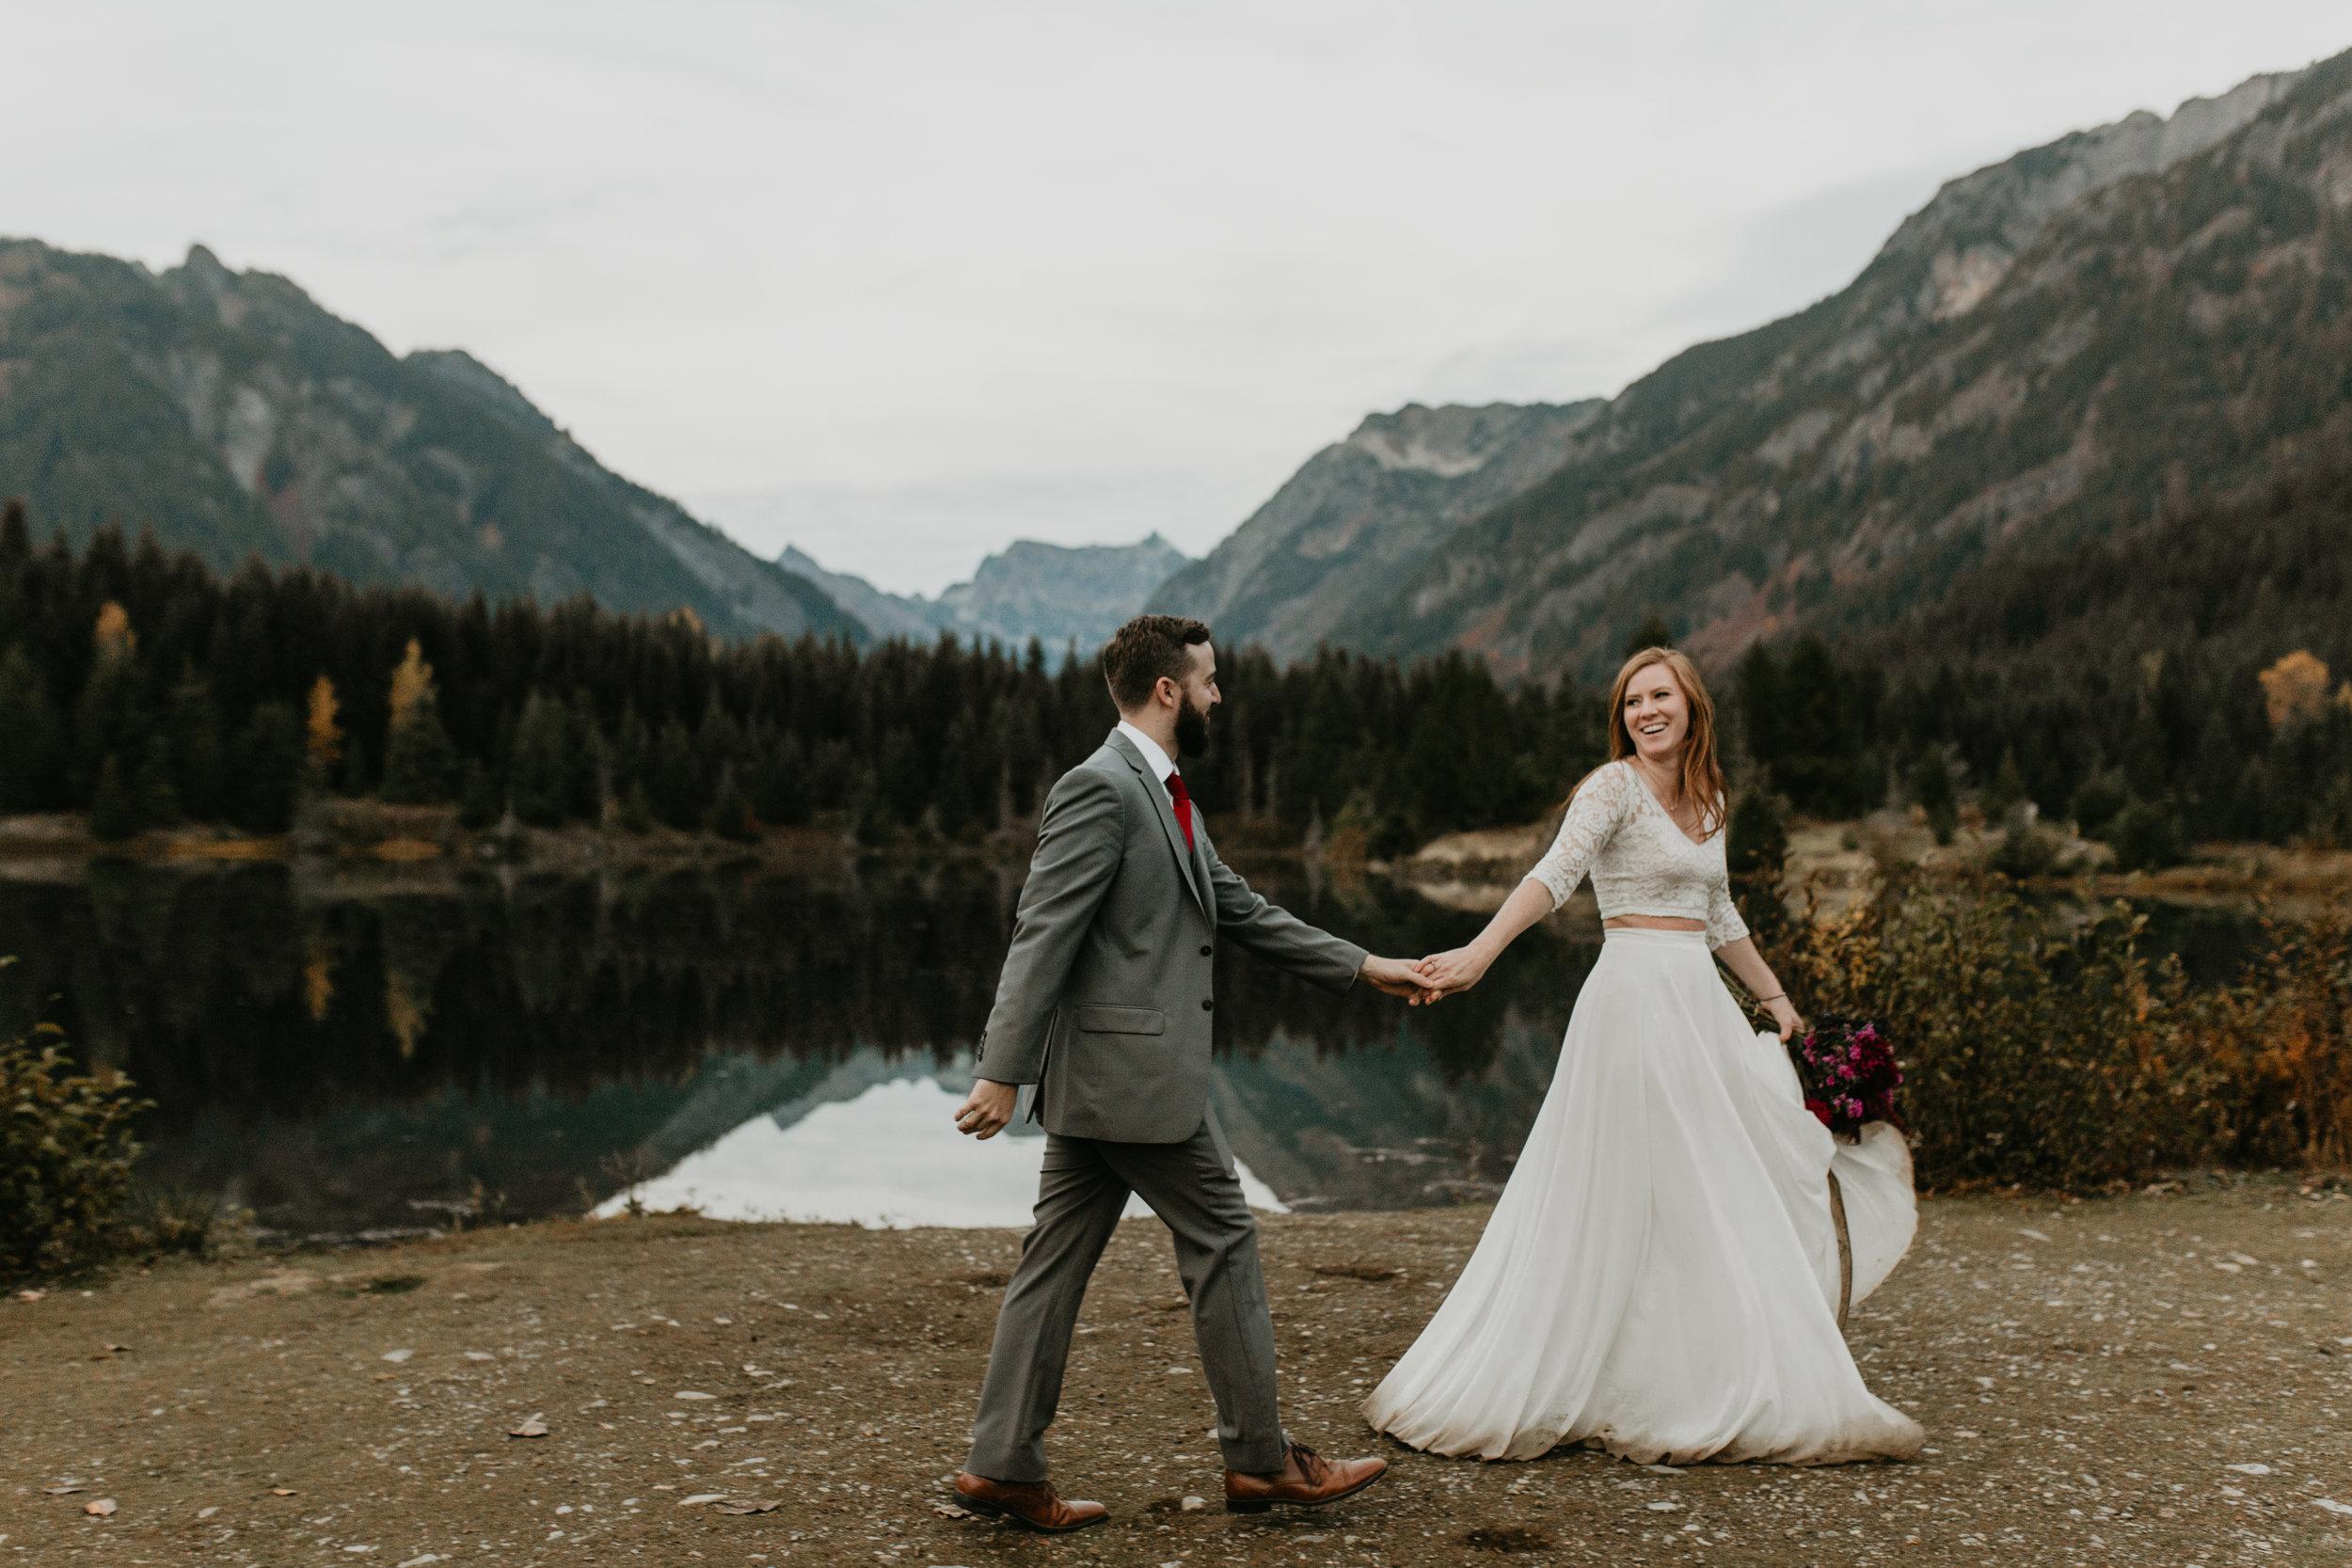 nicole-daacke-photography-mountain-view-elopement-at-gold-creek-pond-snoqualmie-washington-wa-elopement-photographer-photography-adventure-elopement-in-washington-fall-lakeside-golden-sunset-boho-fun-bride-0651.jpg